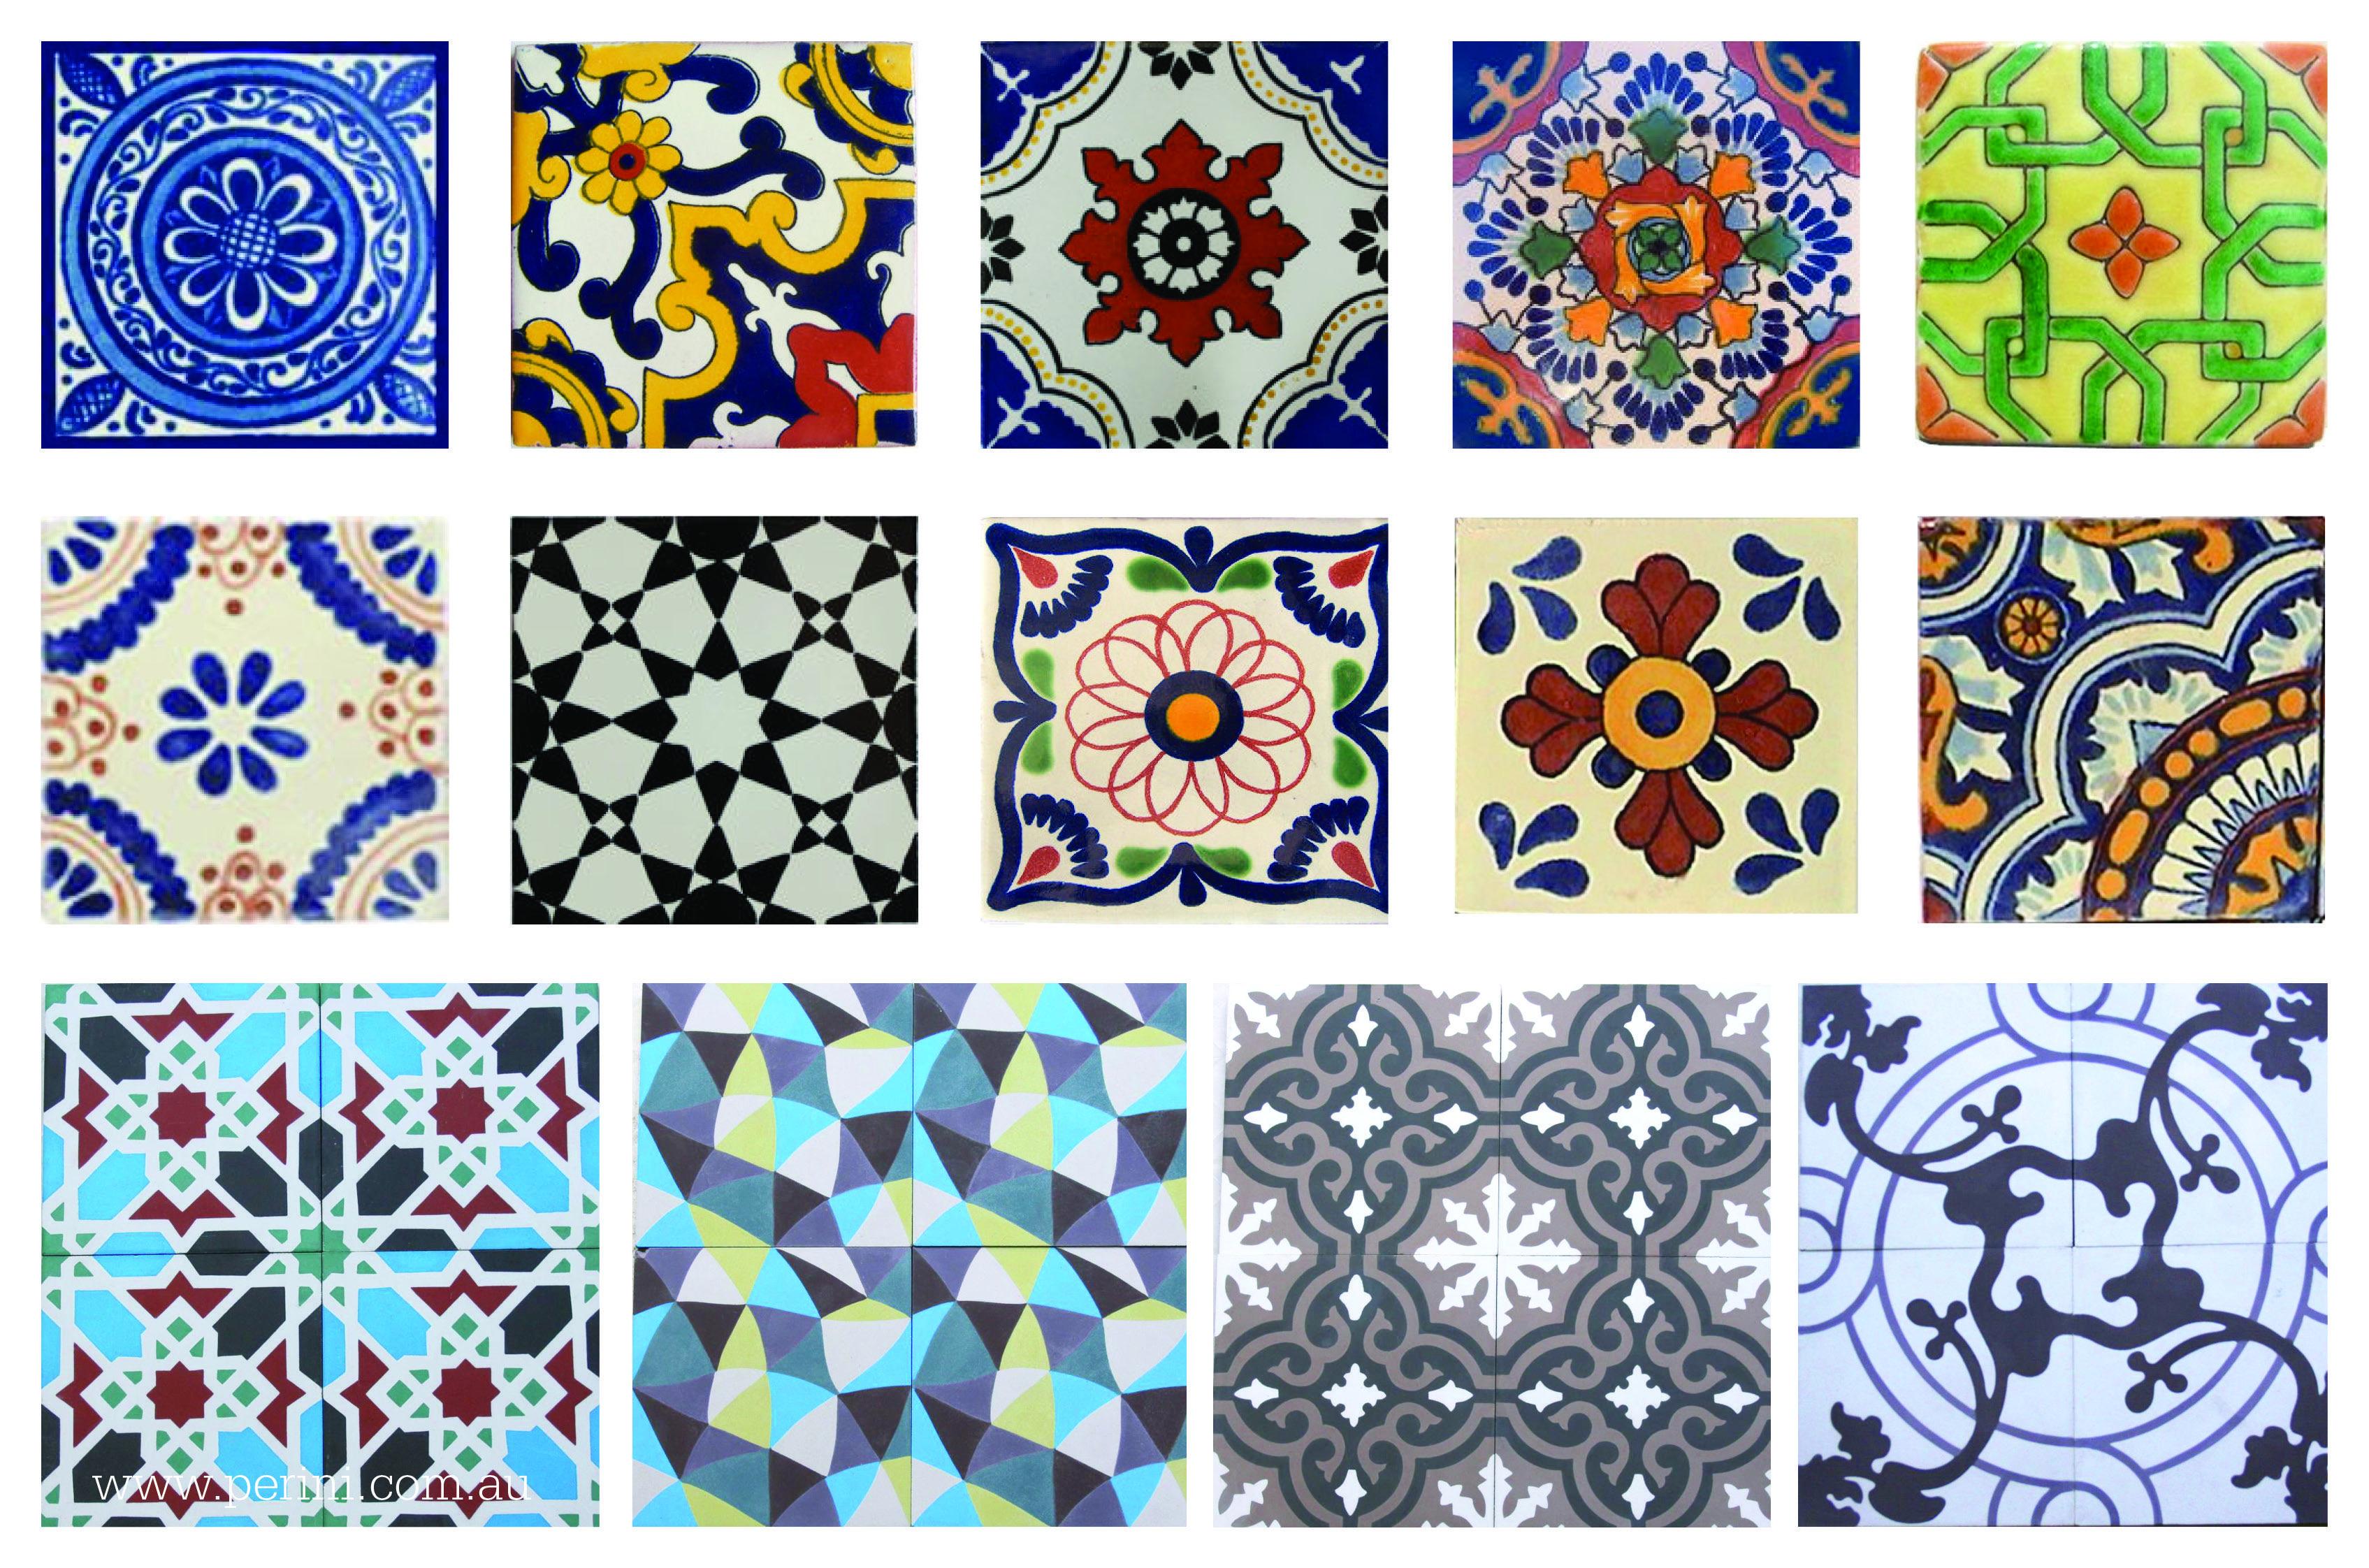 Decorative Tiles Melbourne Captivating Perini Tiles New Moroccan Tiles  Decorative Tiles  Pinterest Design Decoration